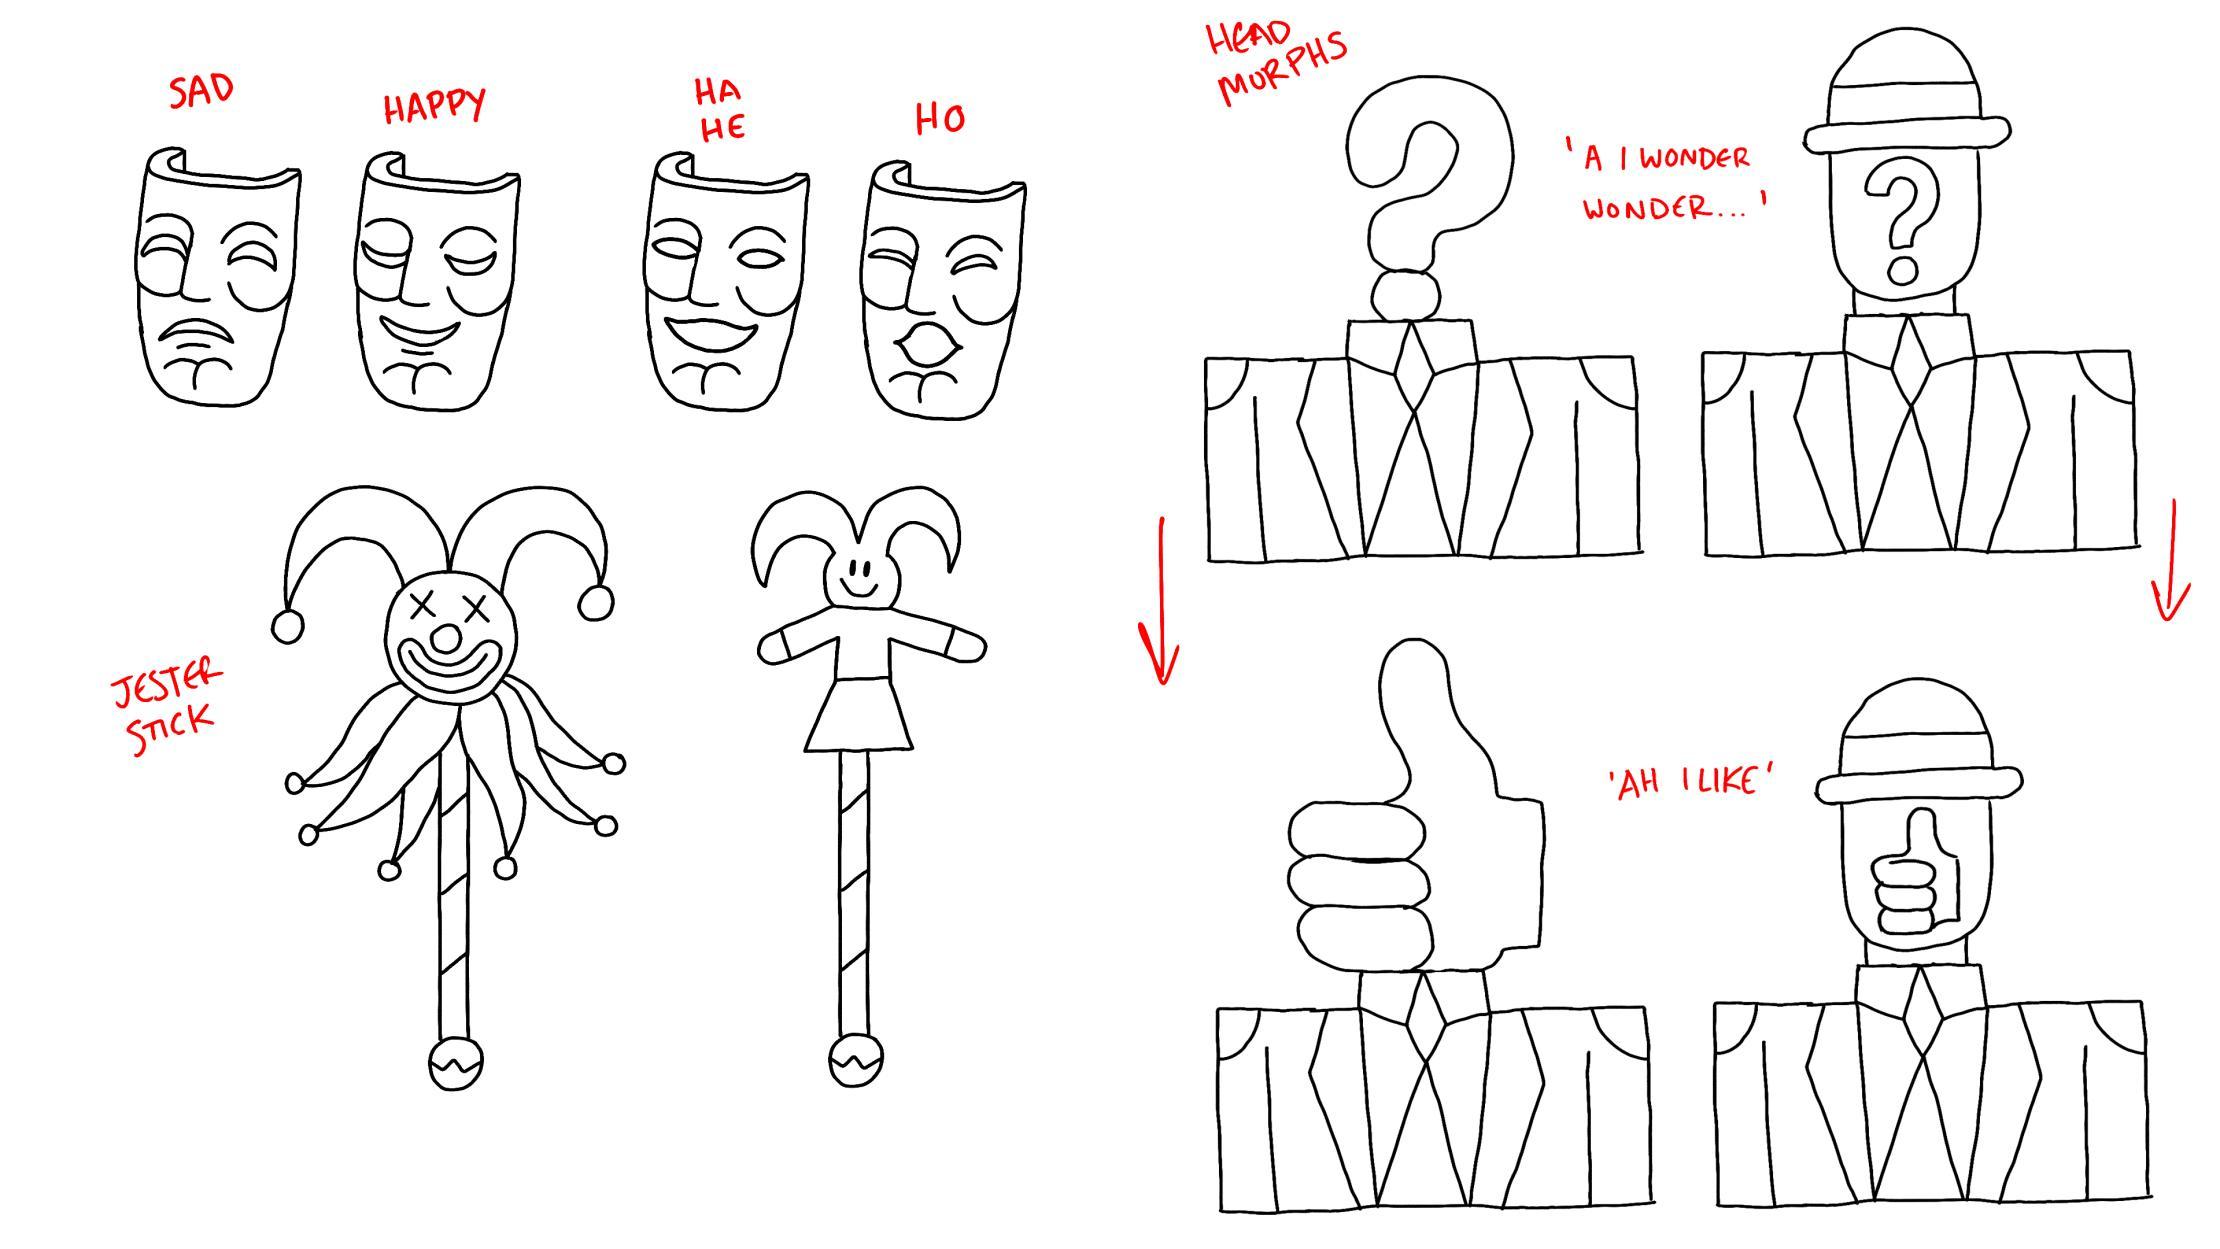 doodles06.jpg